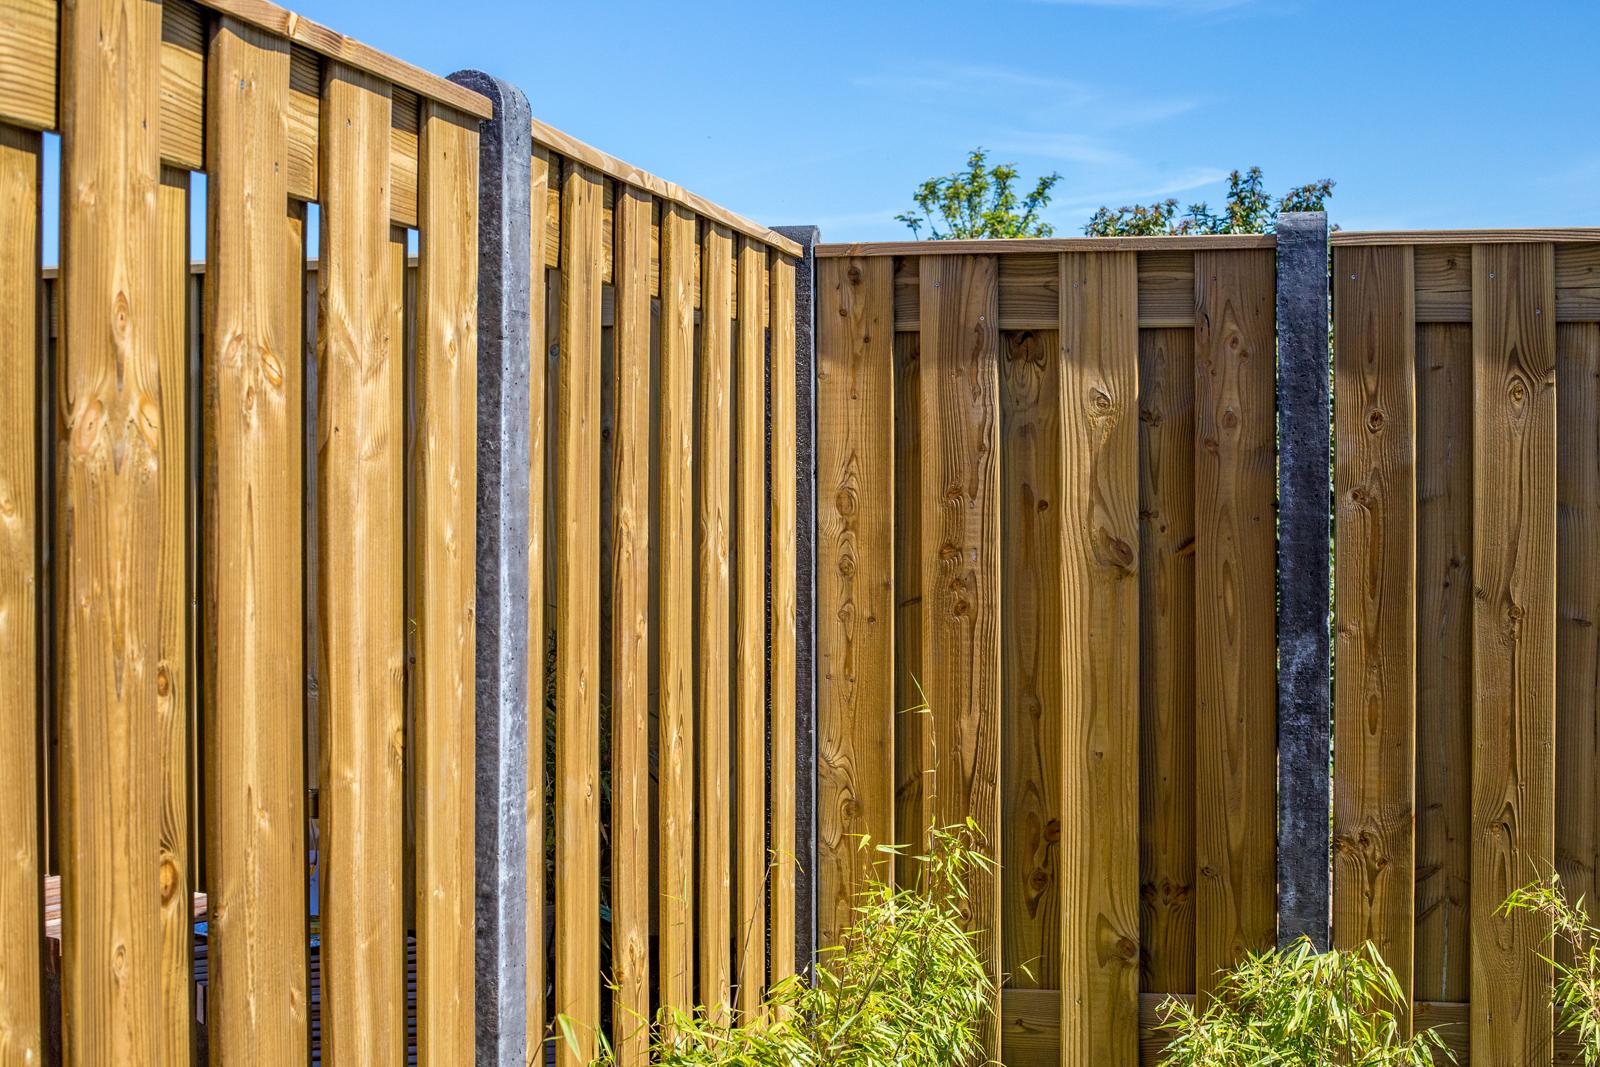 Hout beton schuttingen antraciet 200x190cm 21 planks per set